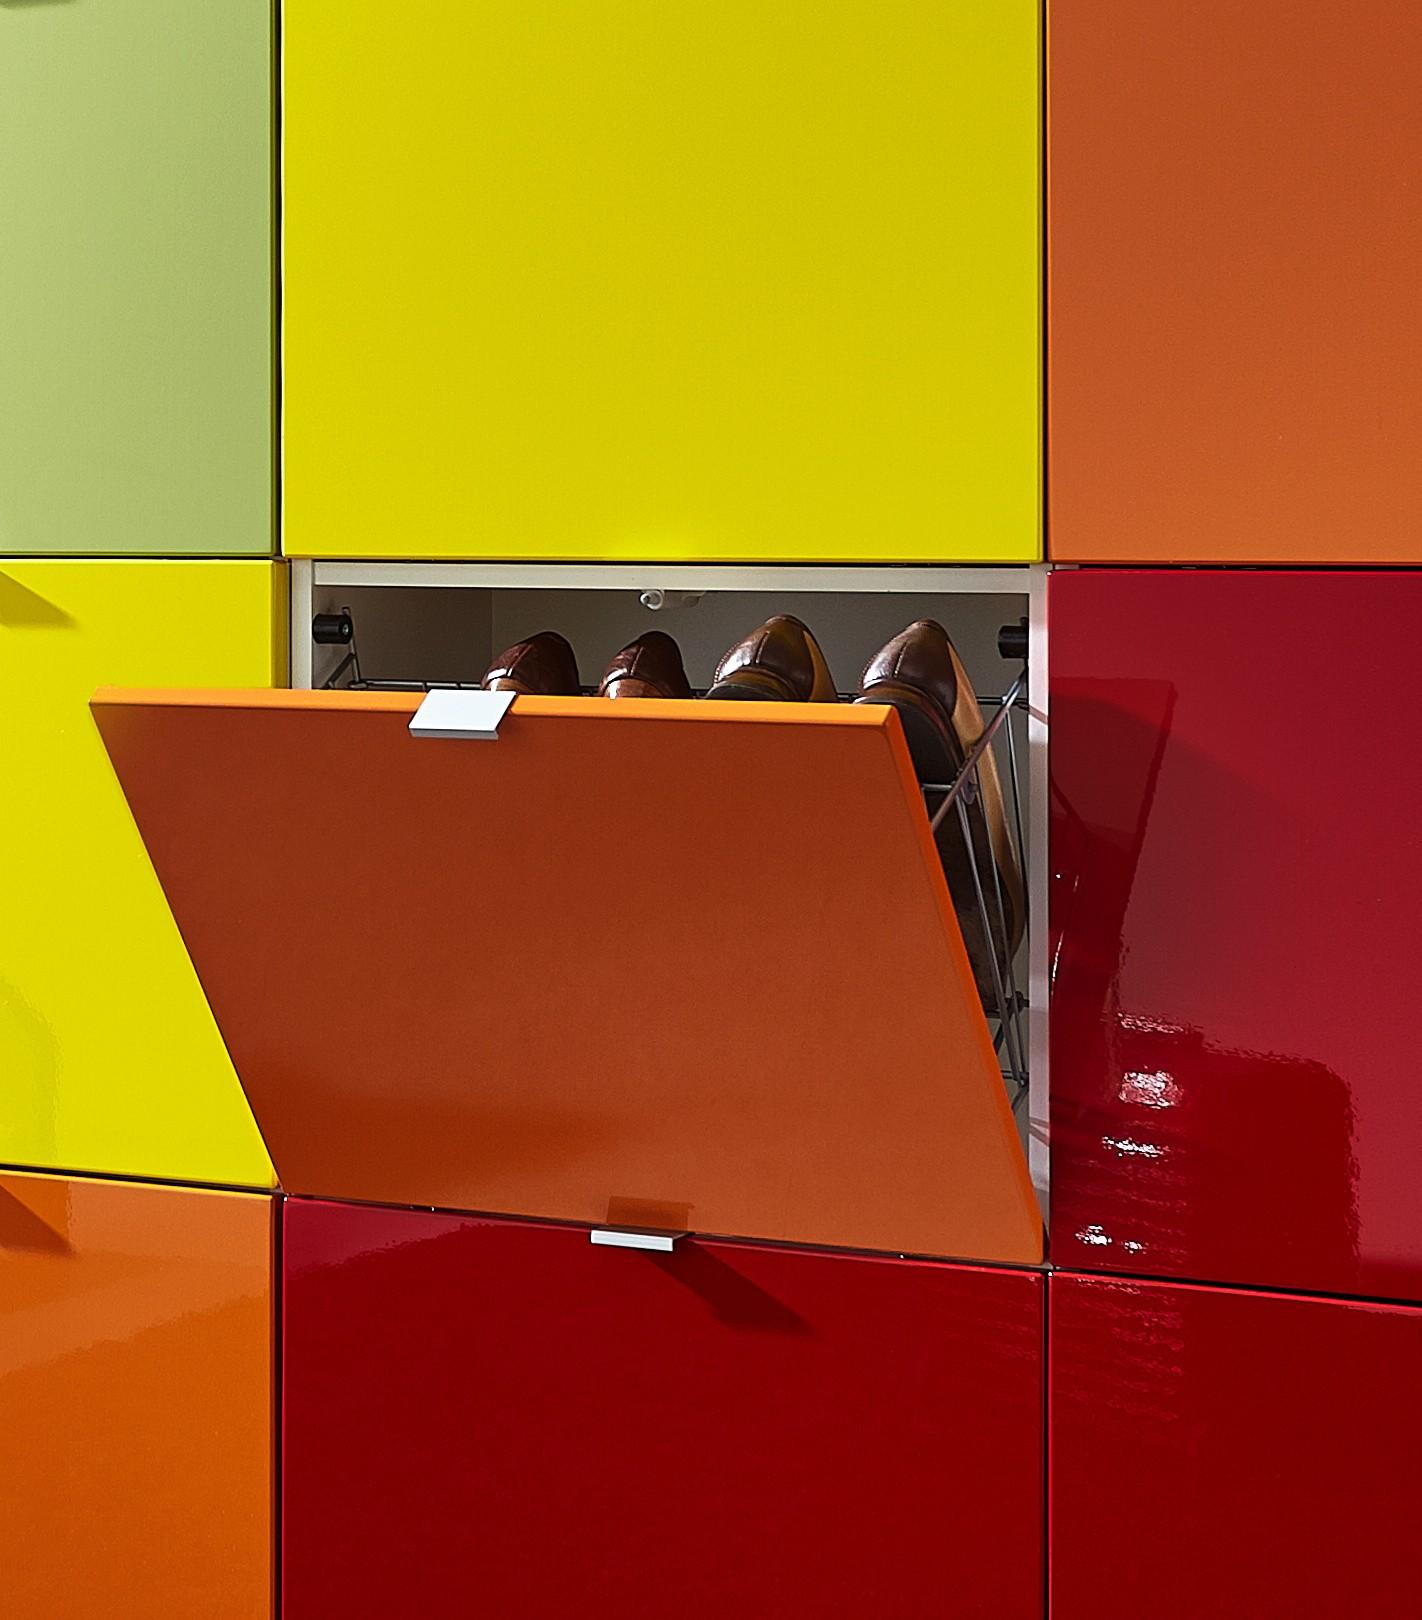 schuhschrank wand potpourri bunter schuhkipper bis zu 64 paar schuhe vielfarbig ebay. Black Bedroom Furniture Sets. Home Design Ideas